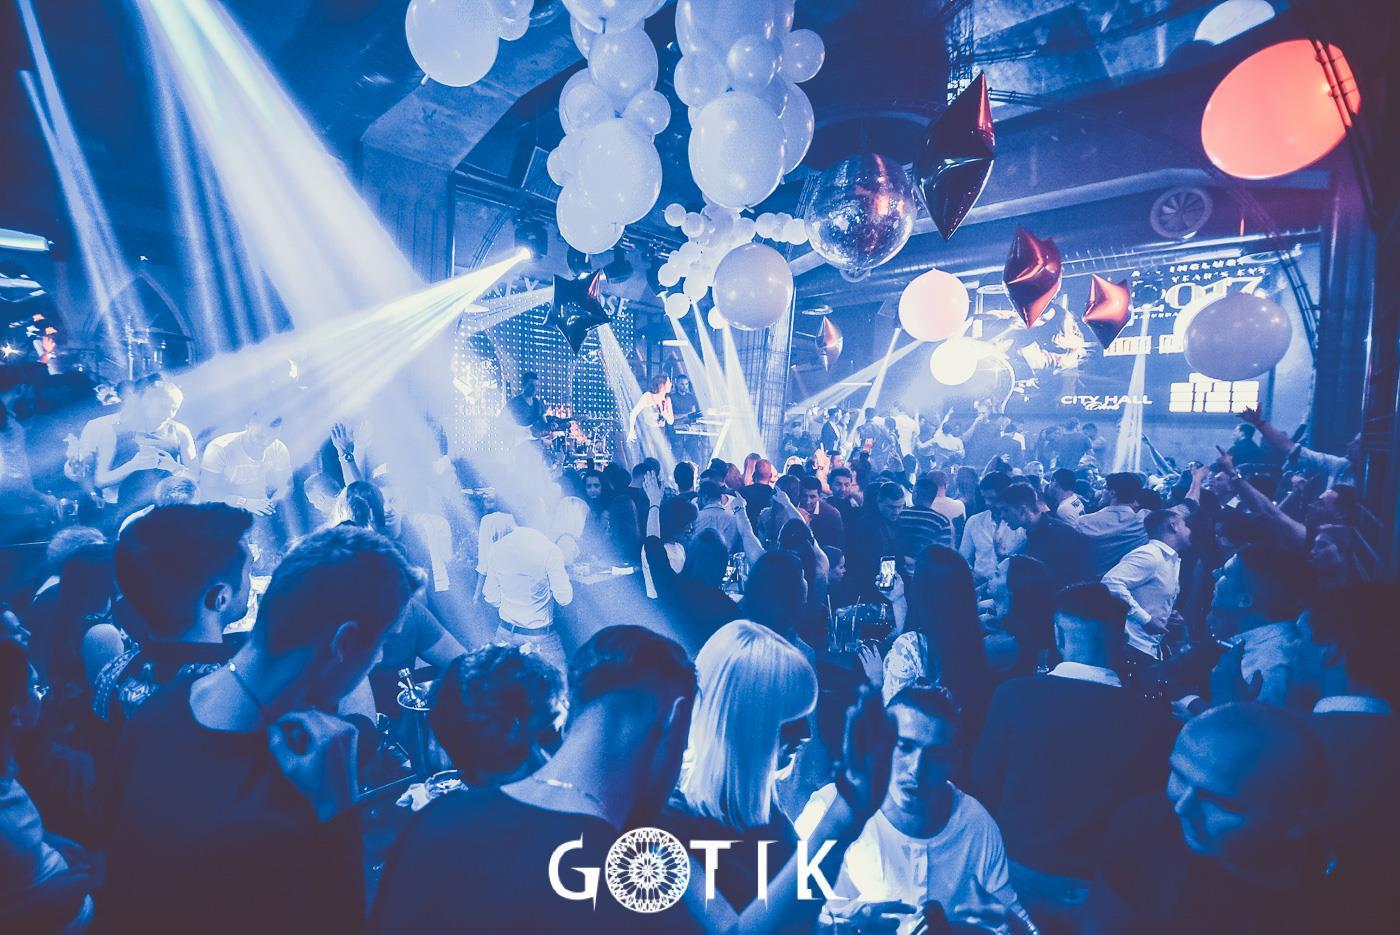 Izuzetan noćni izlazak u Klub Gotik